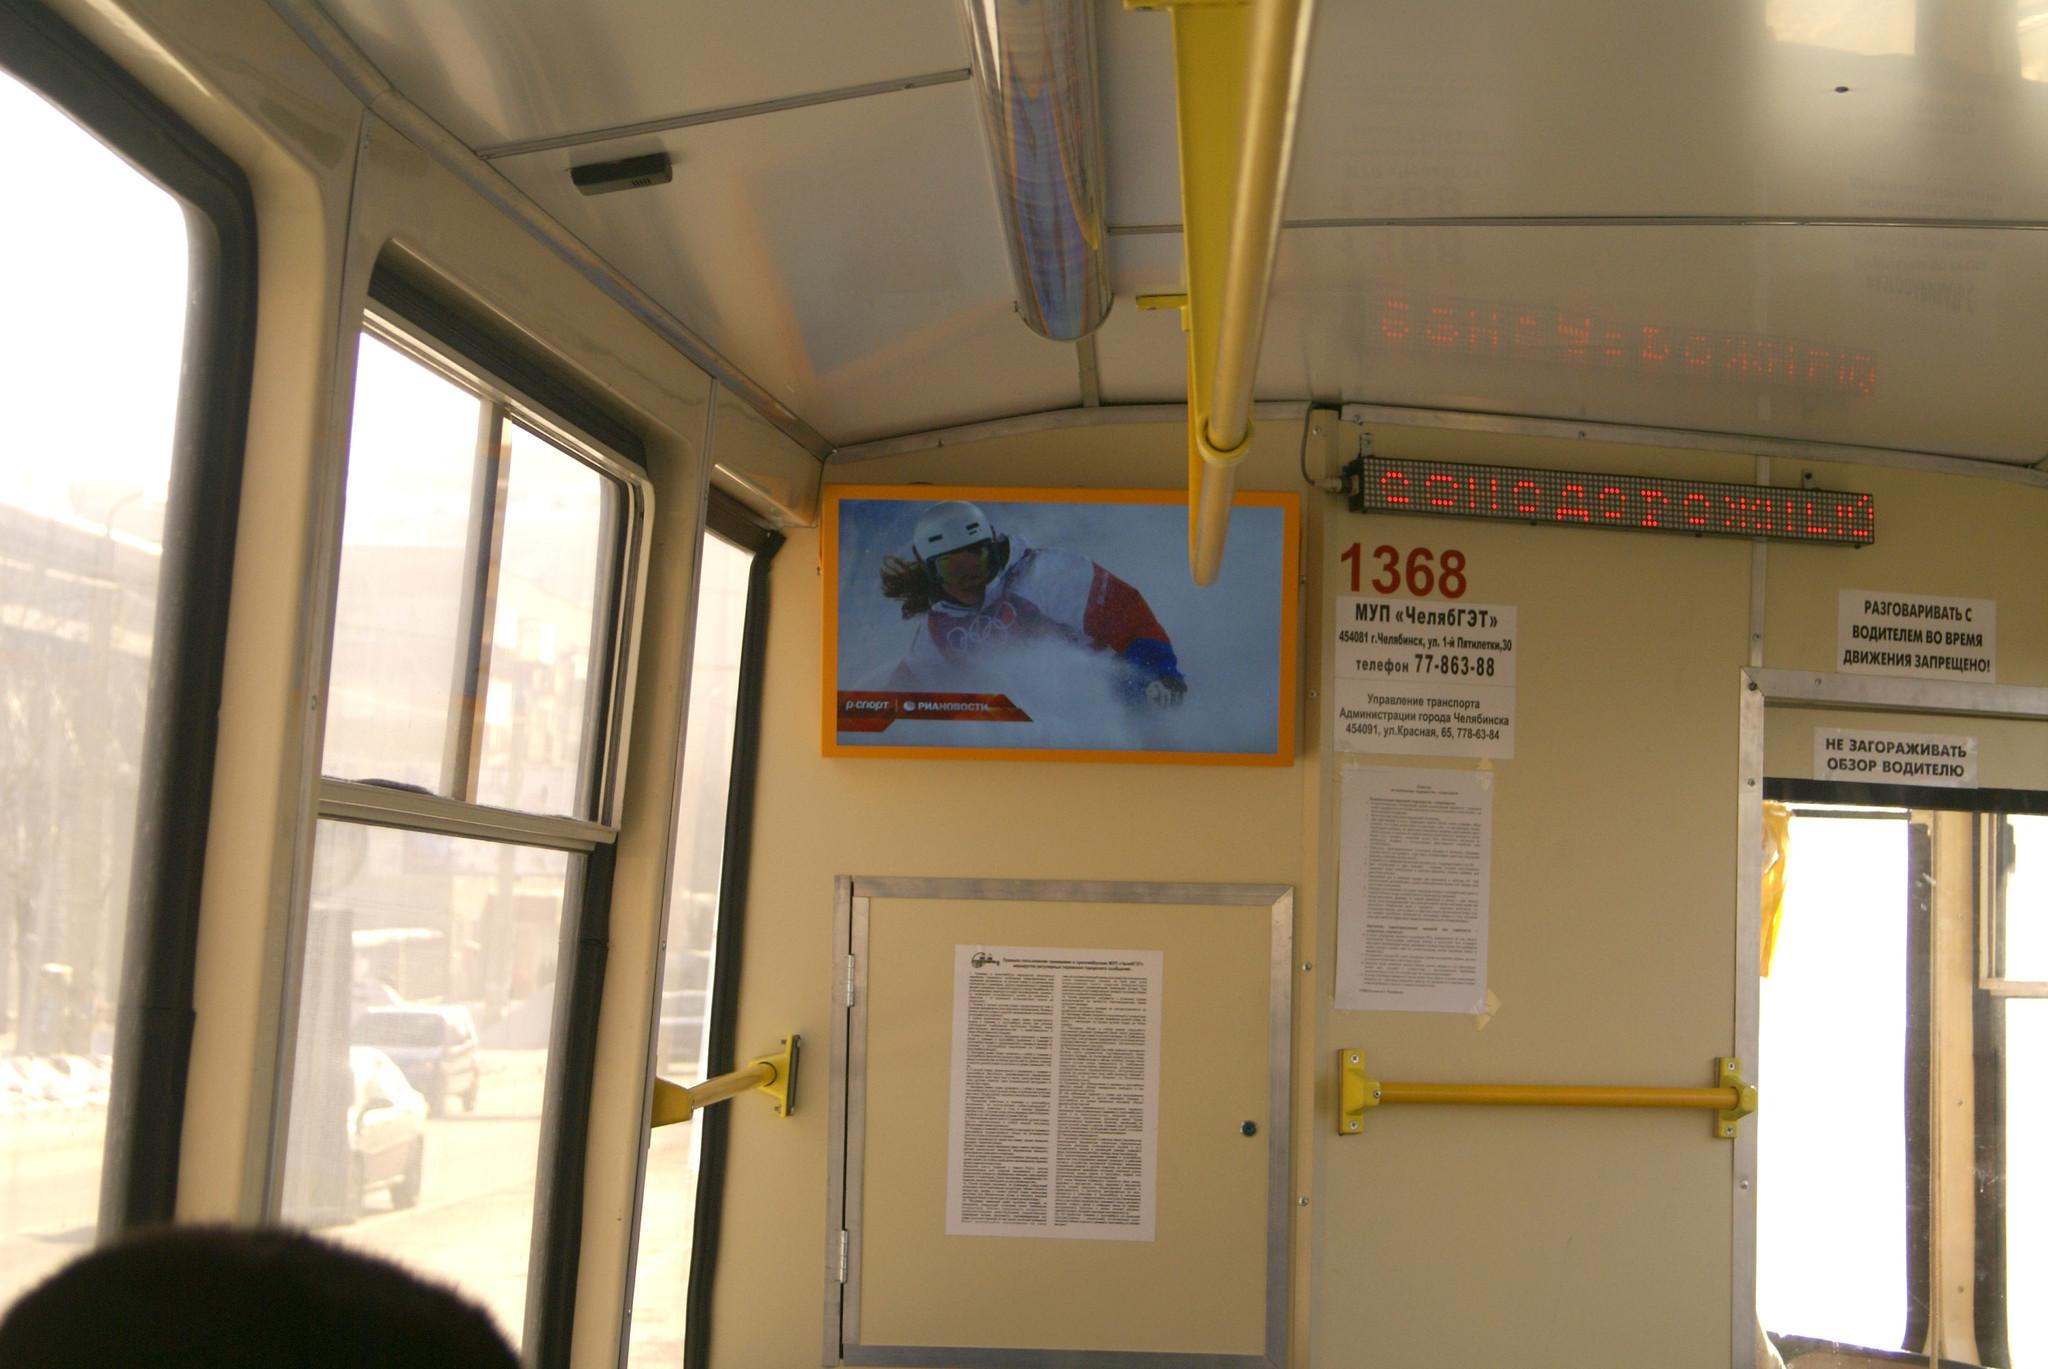 Фото монитора в общественном транспорте с кадрами Олимпиады в Сочи от РИА НОВОСТИ